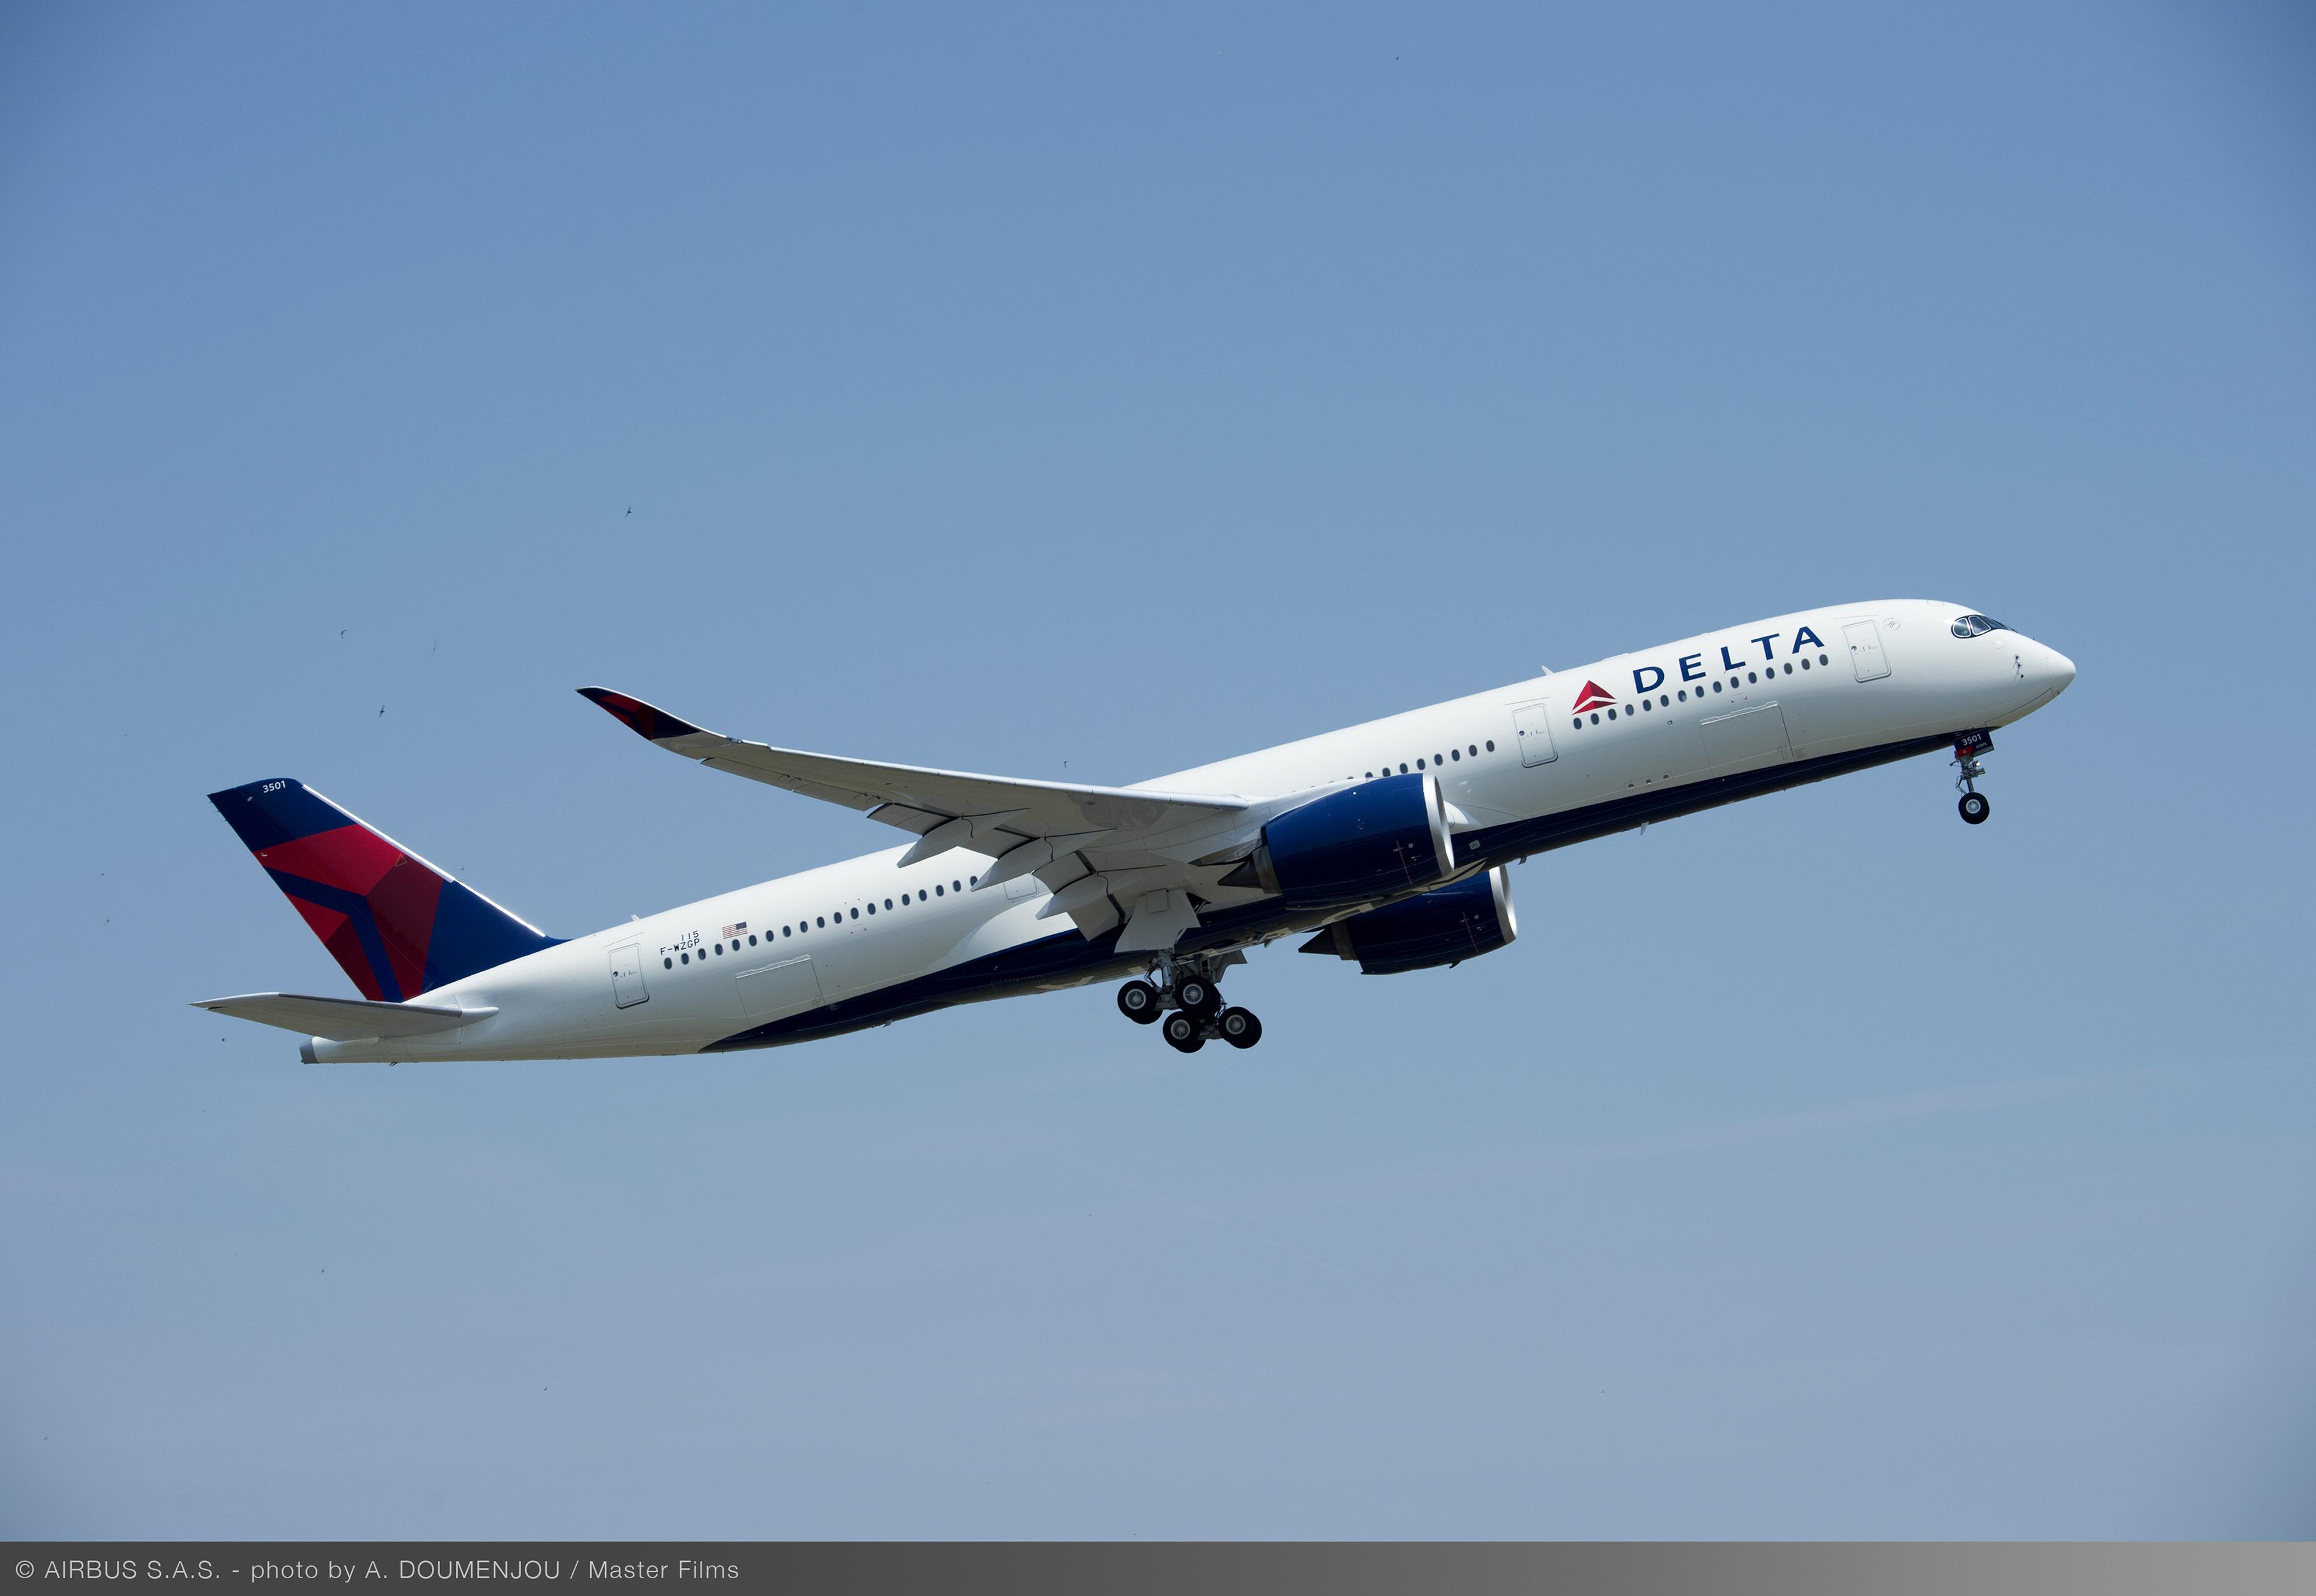 A350 airborne